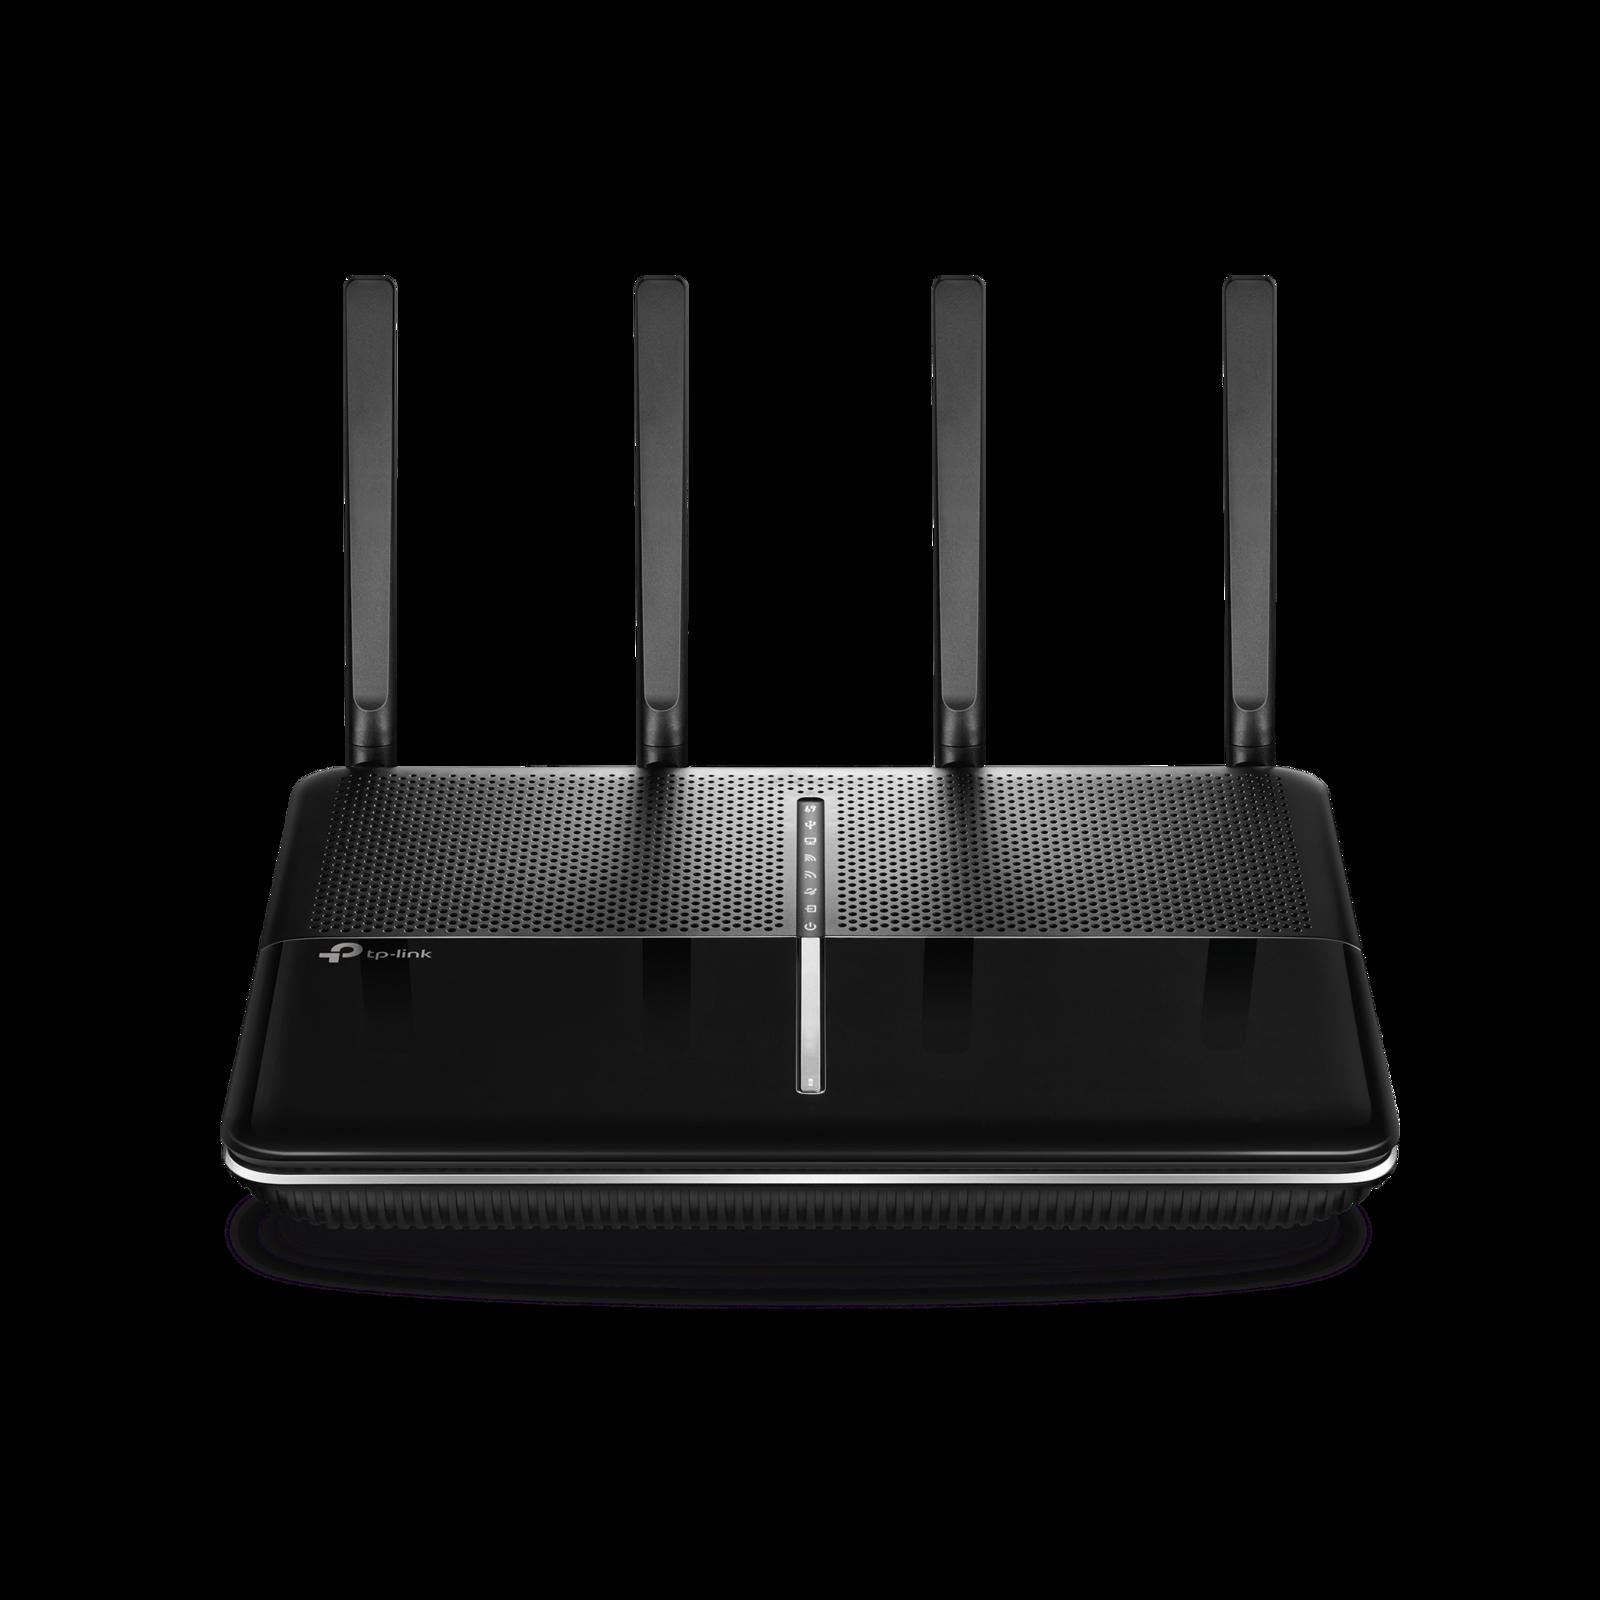 TP-Link Archer VR2800 Wireless VDSL/ADSL Modem Router